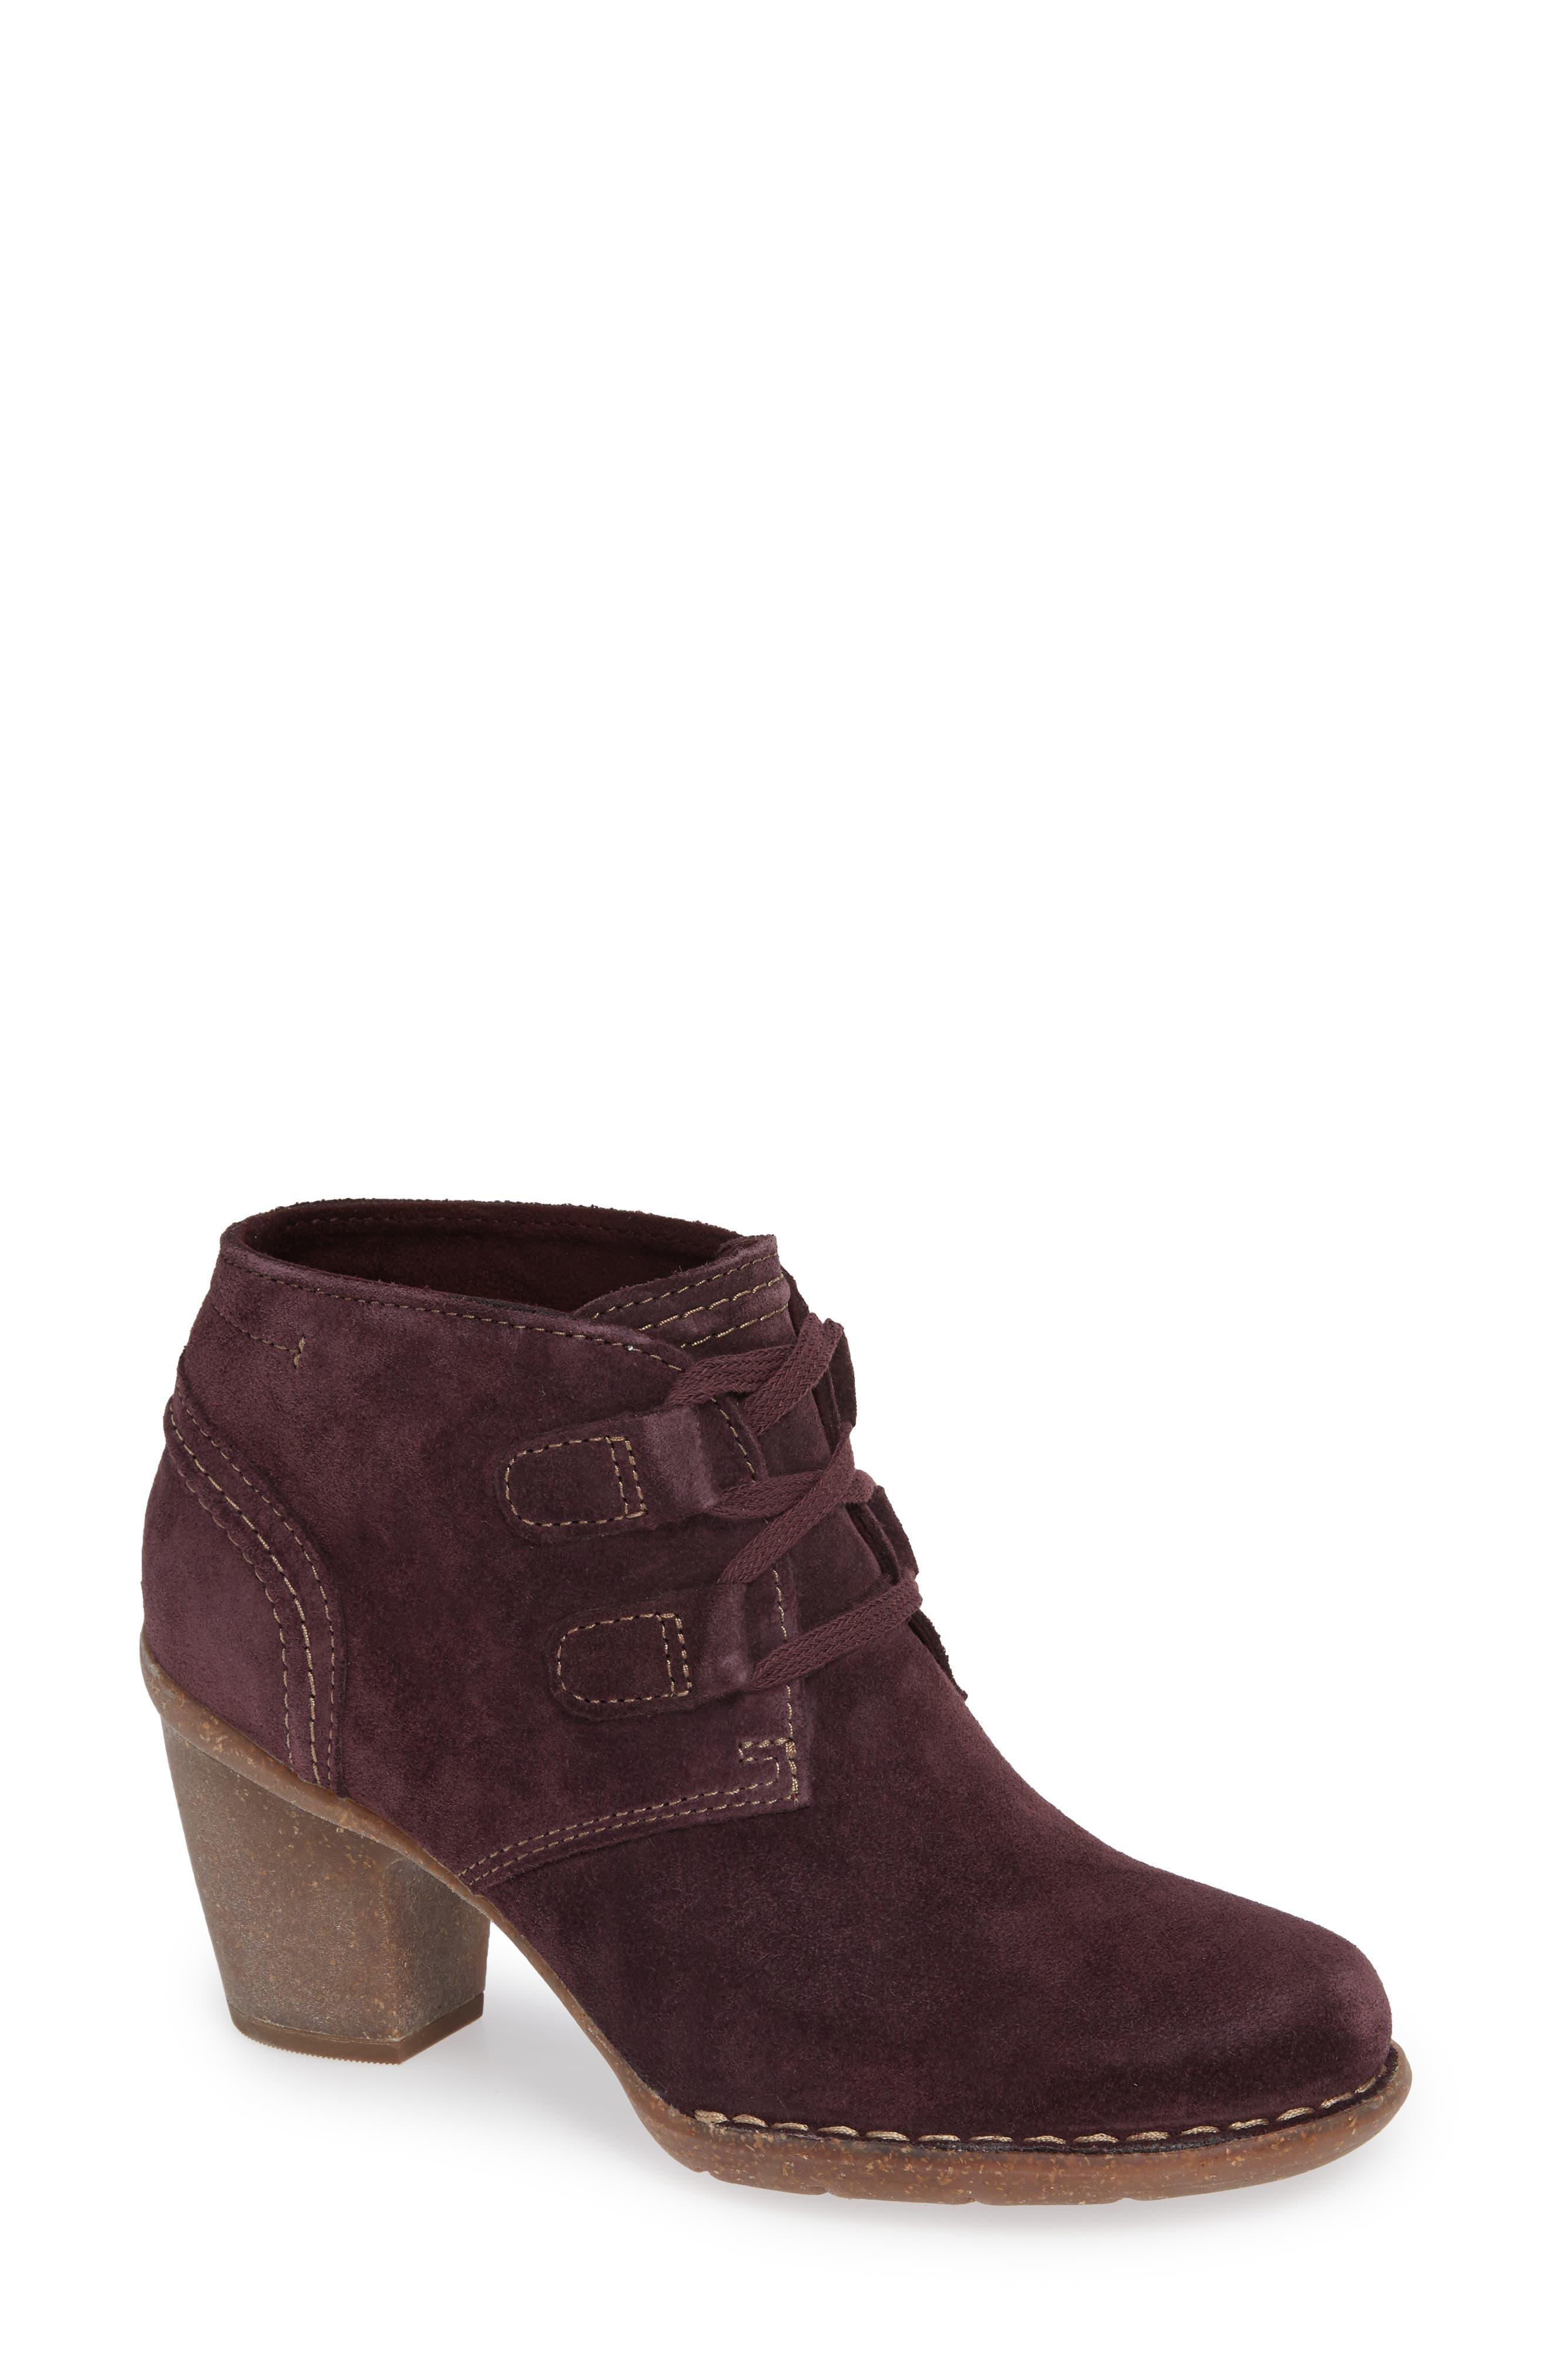 'Carleta Lyon' Ankle Boot,                             Main thumbnail 1, color,                             AUBERGINE SUEDE